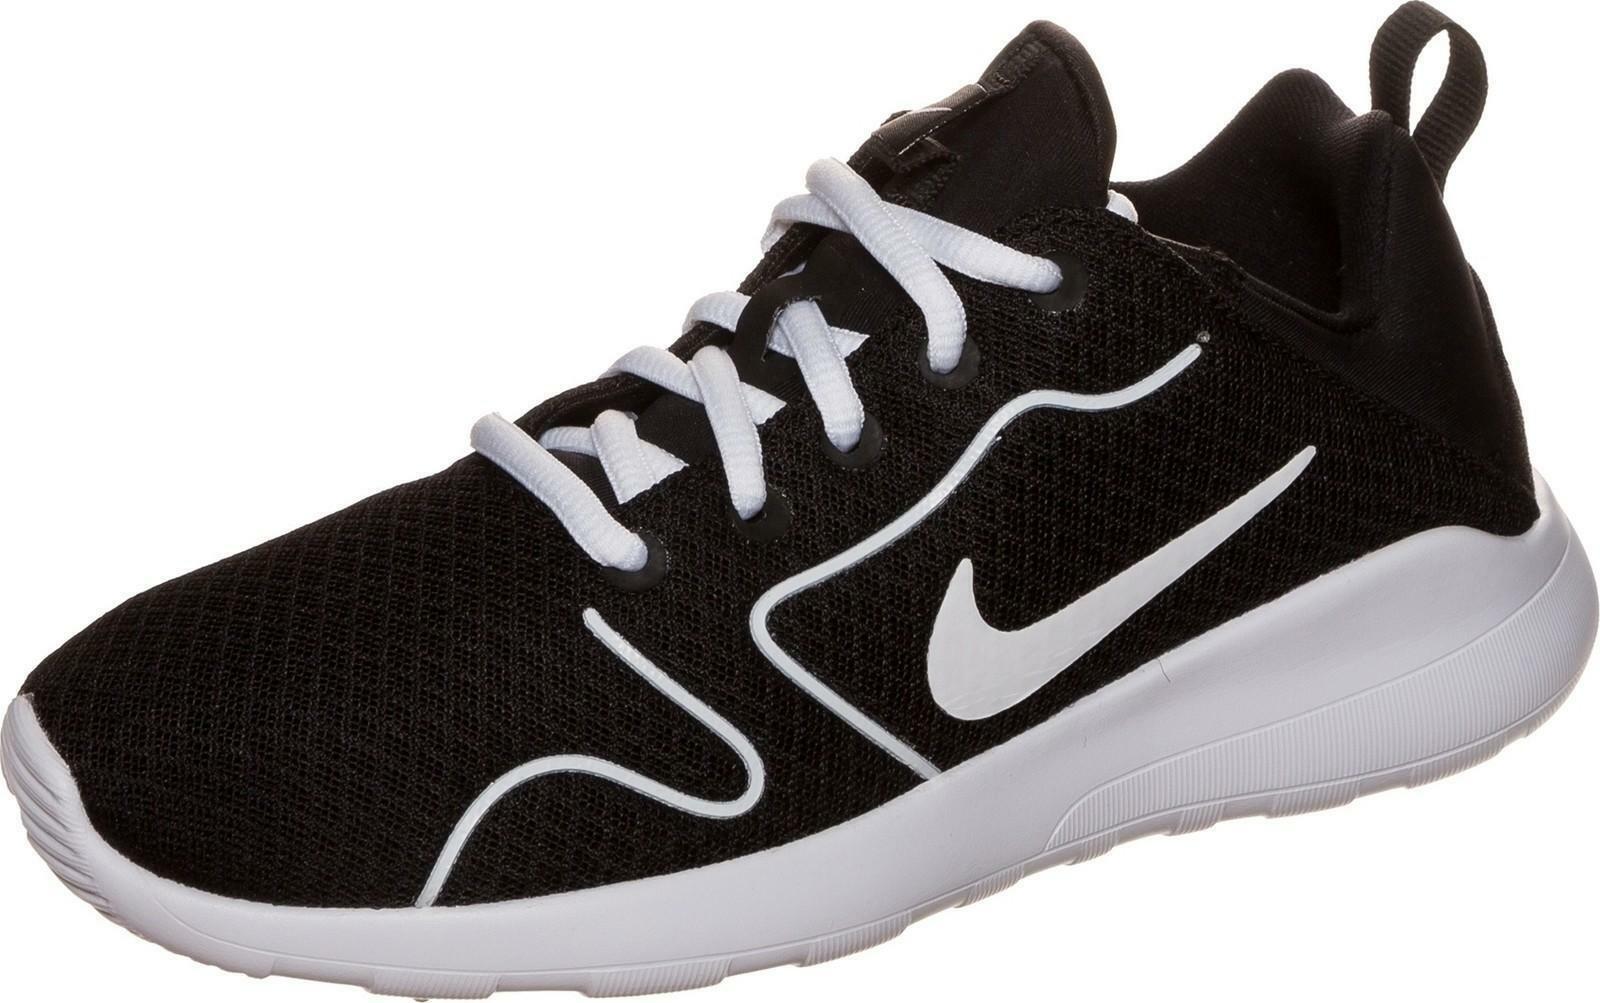 brand new f2a0c b2081 Nike Kaishi 2.0 Scarpe Sportive Donna Tela Nero   eBay